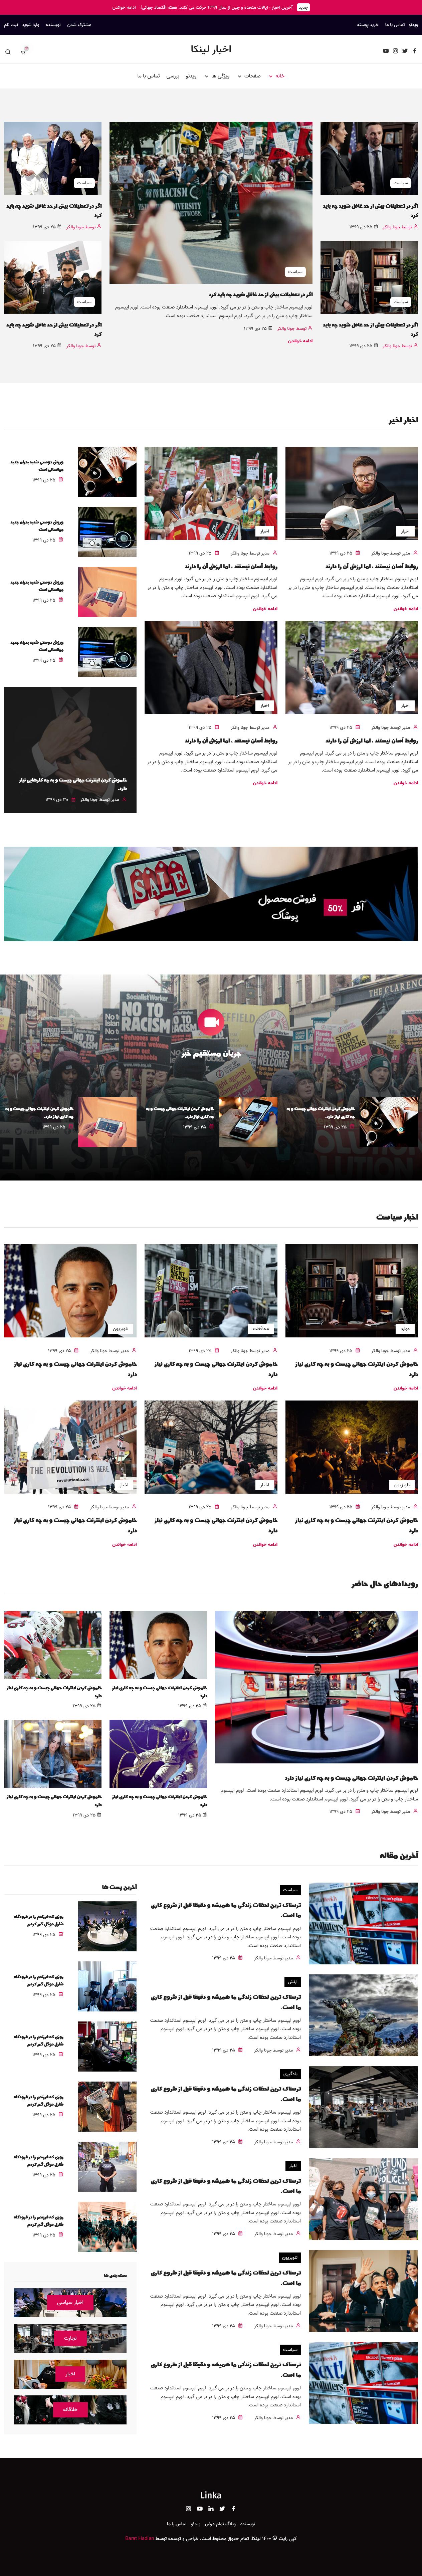 دموی قالب HTML خبری لینکا